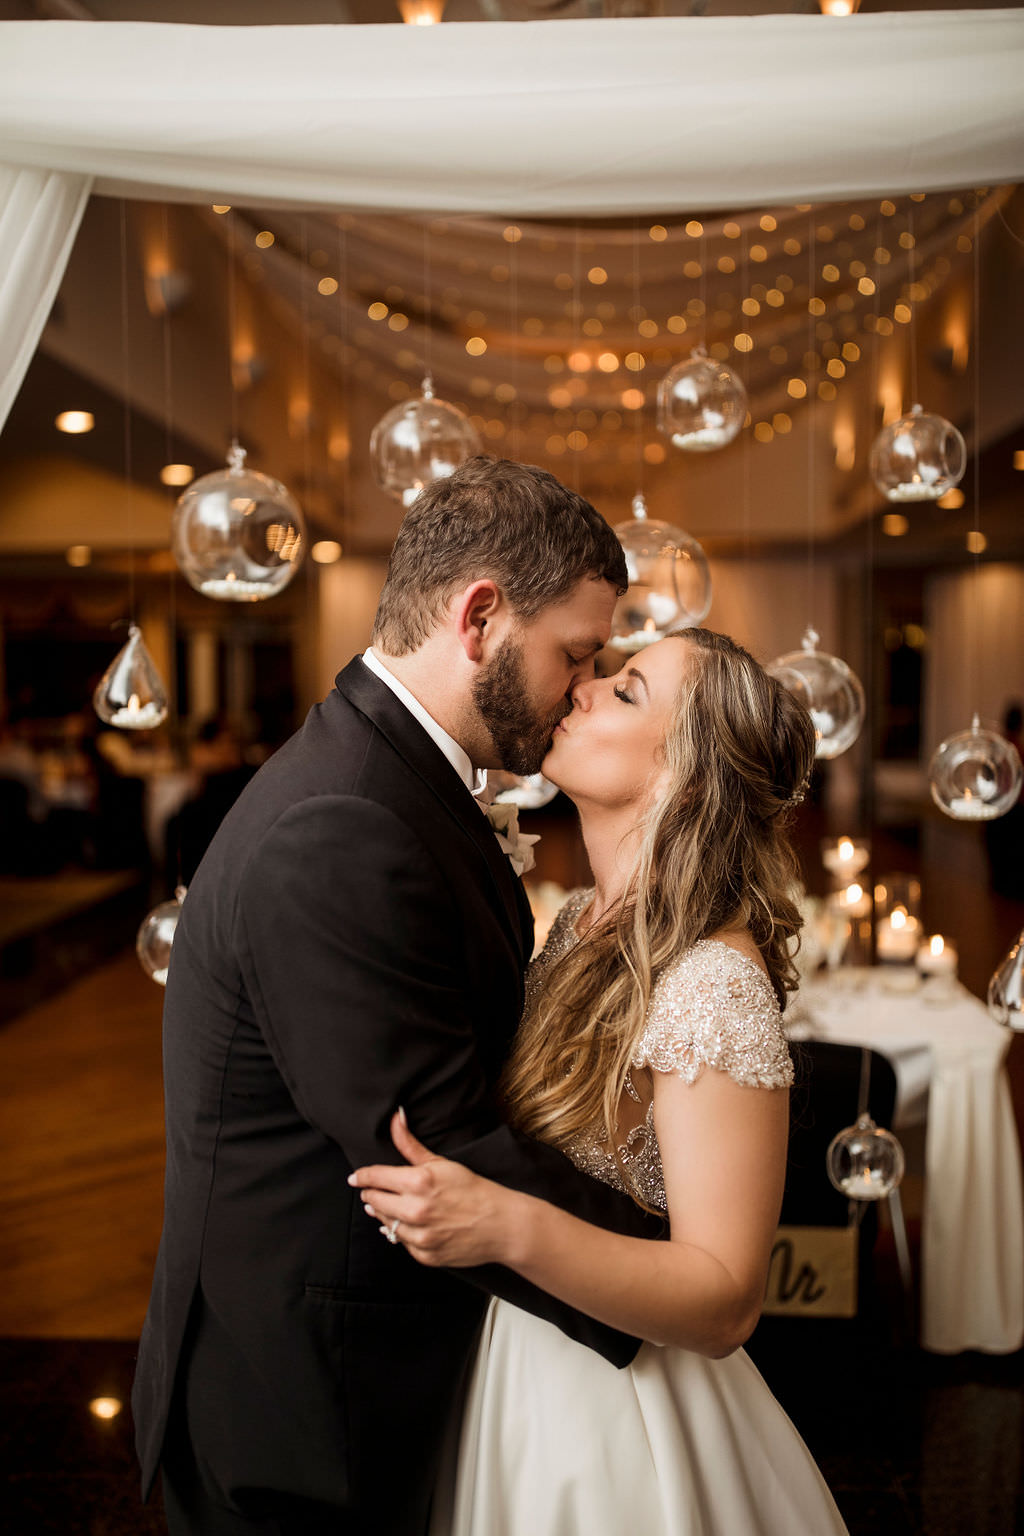 Florida Classic Bride and Groom Kissing Wedding Reception Portrait